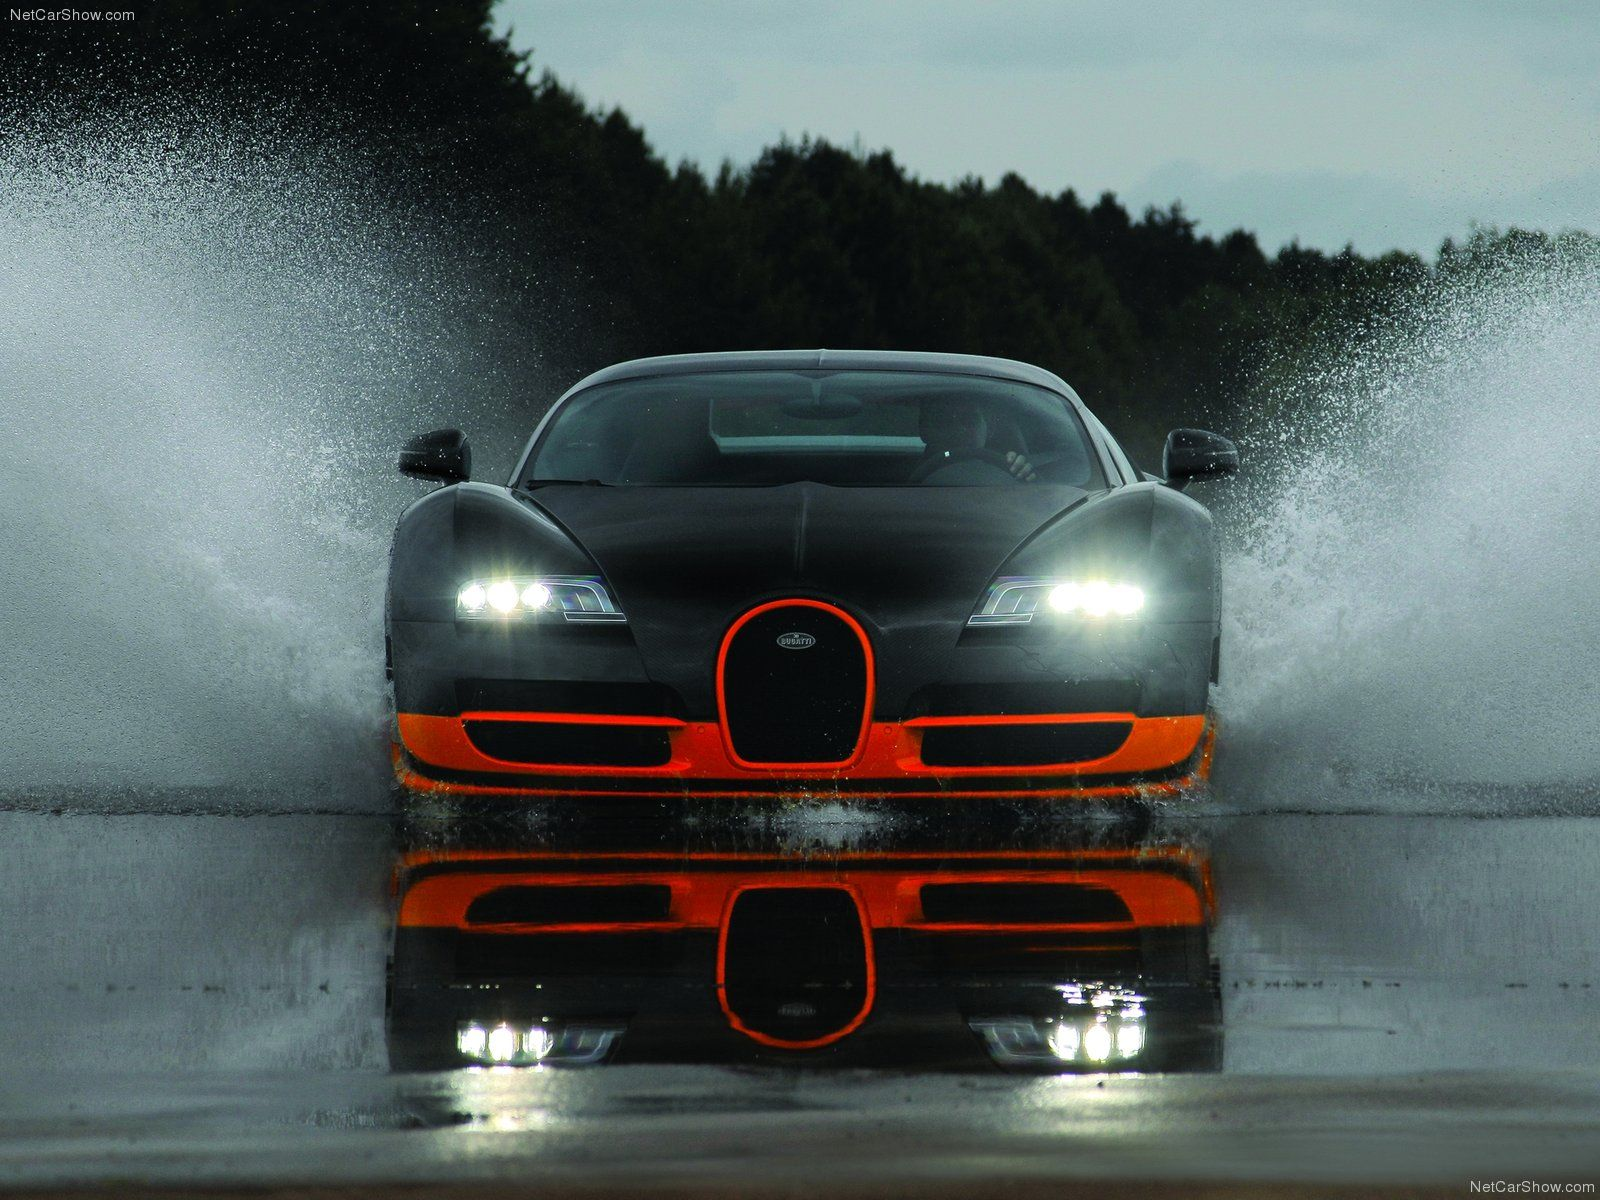 bugatti_veyron_wallpaper_hd_013 Fascinating Bugatti Veyron Price south African Rands Cars Trend